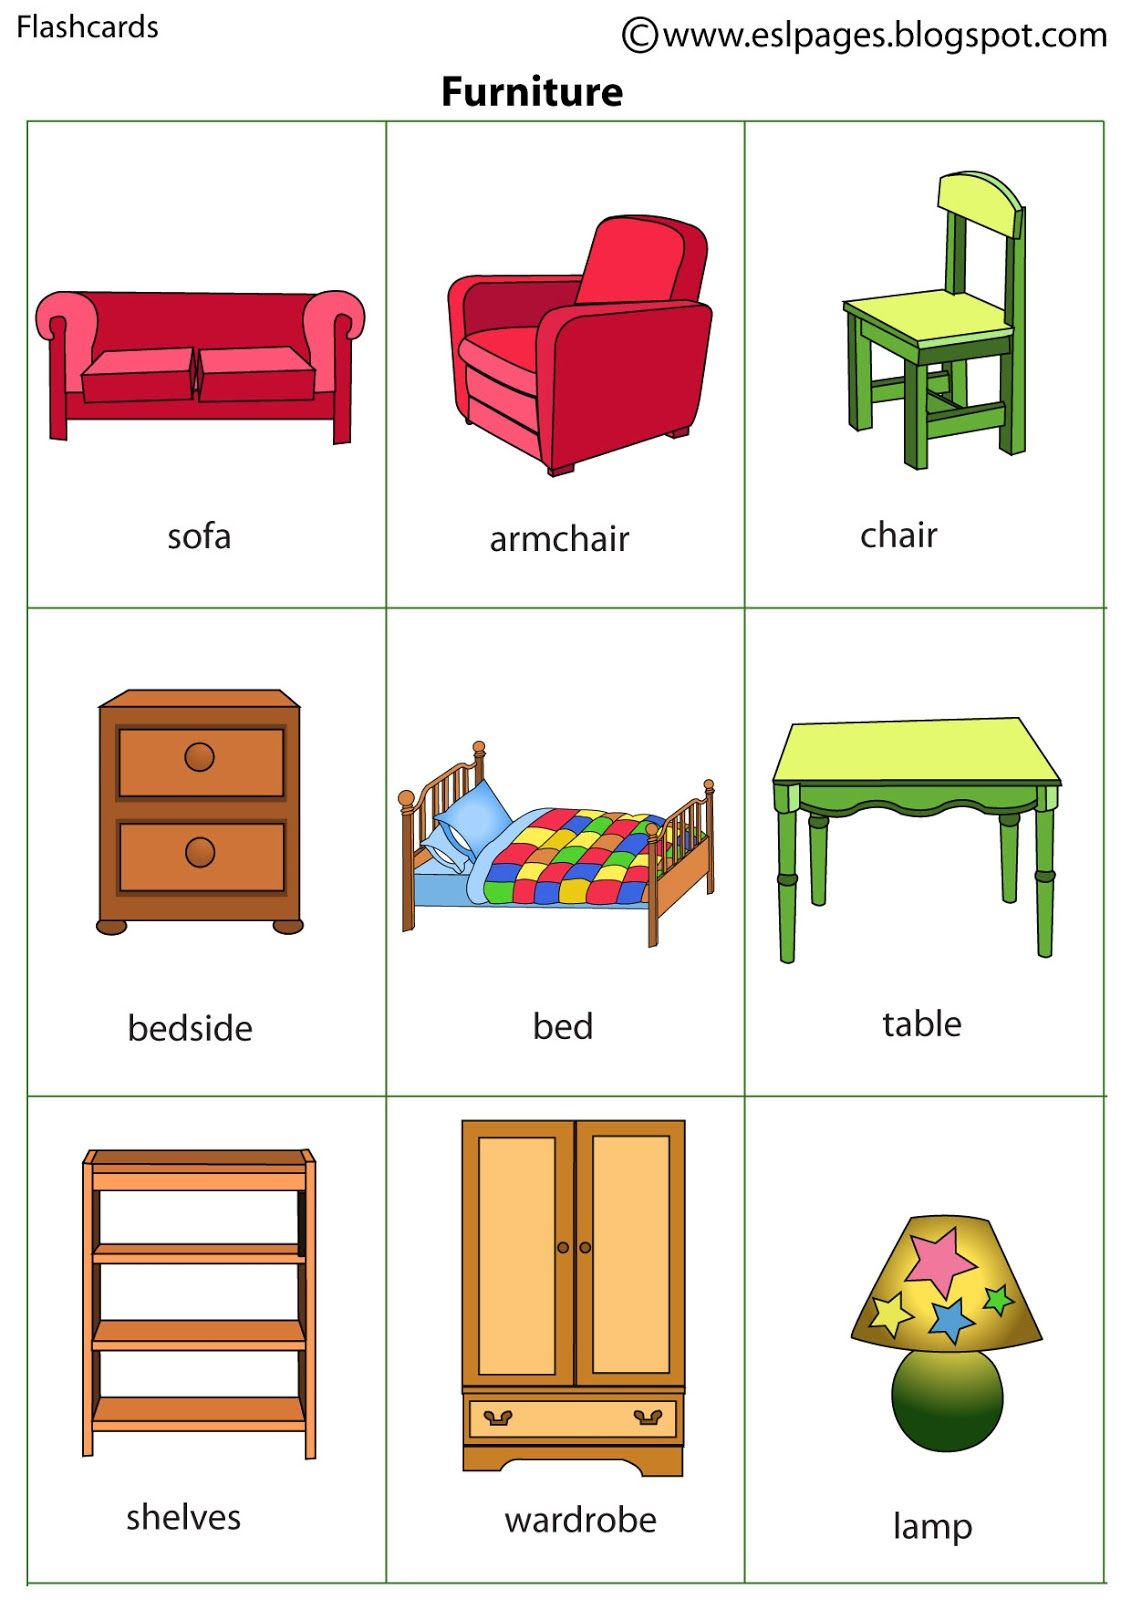 R sultat de recherche d 39 images pour furniture flashcards for Mobilia in inglese